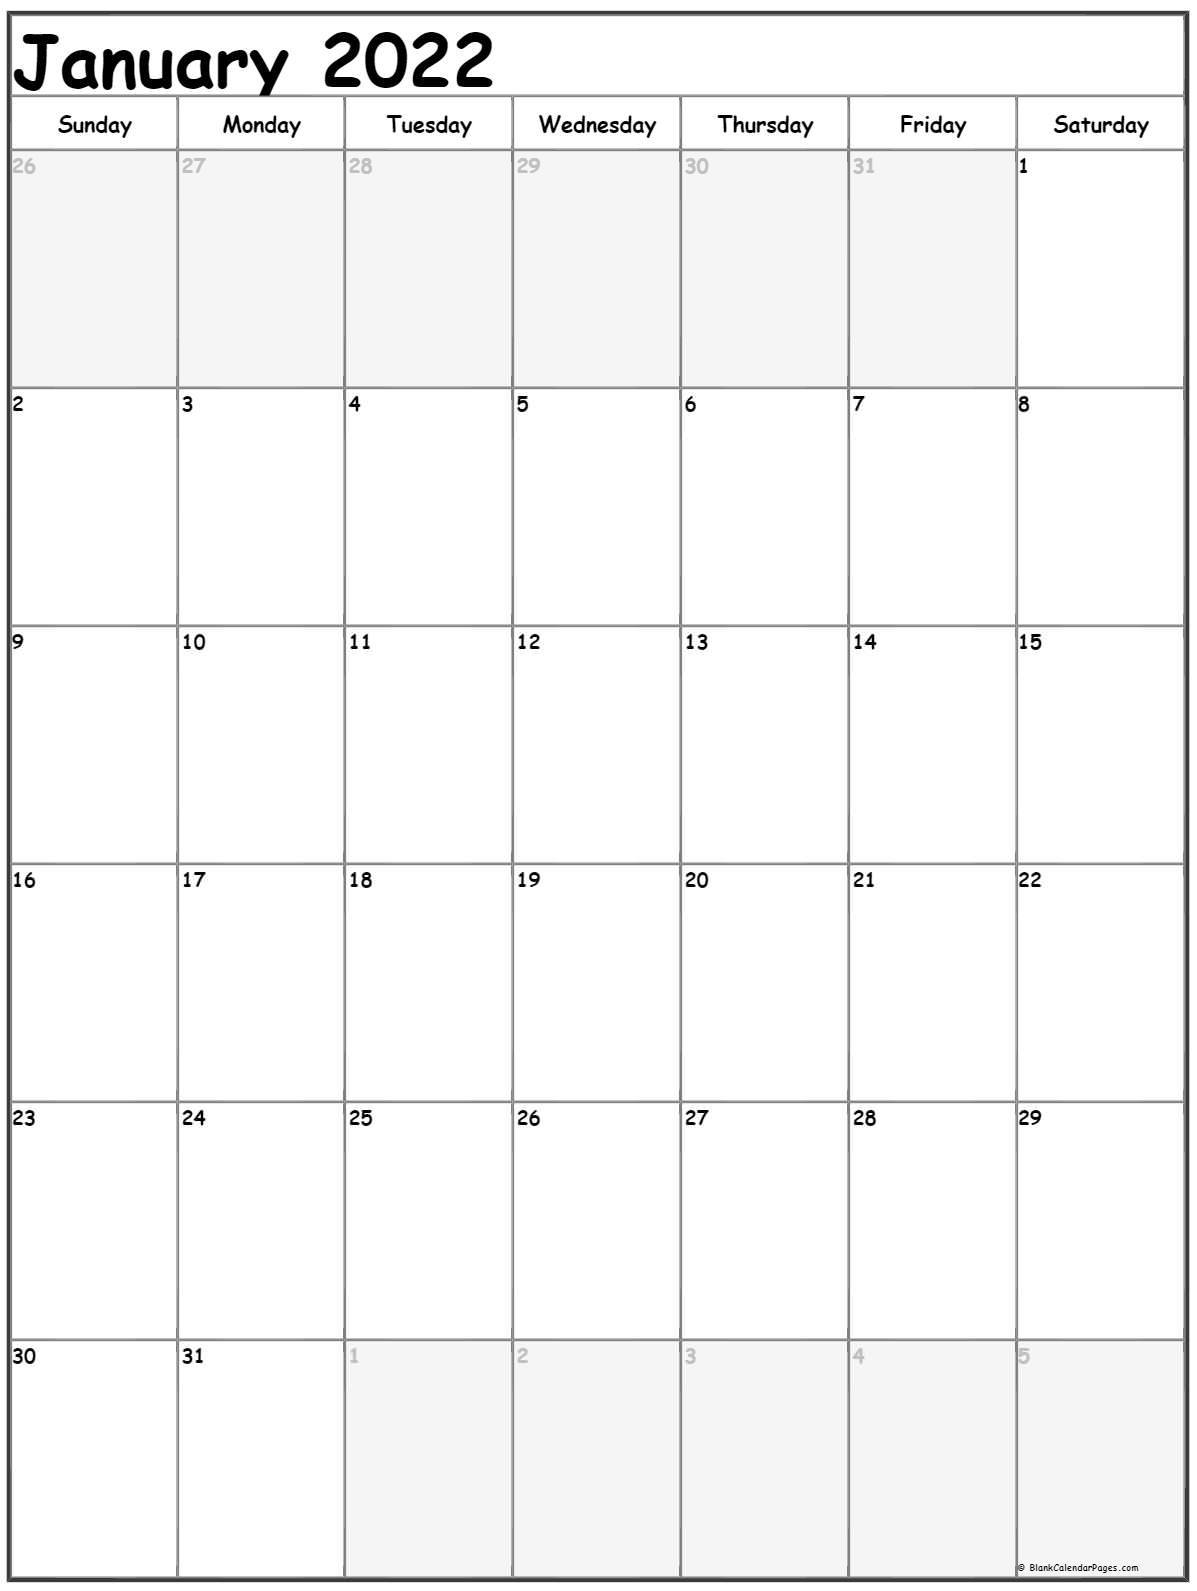 January 2022 Vertical Calendar | Portrait Pertaining To Landscape Calendar January 2022